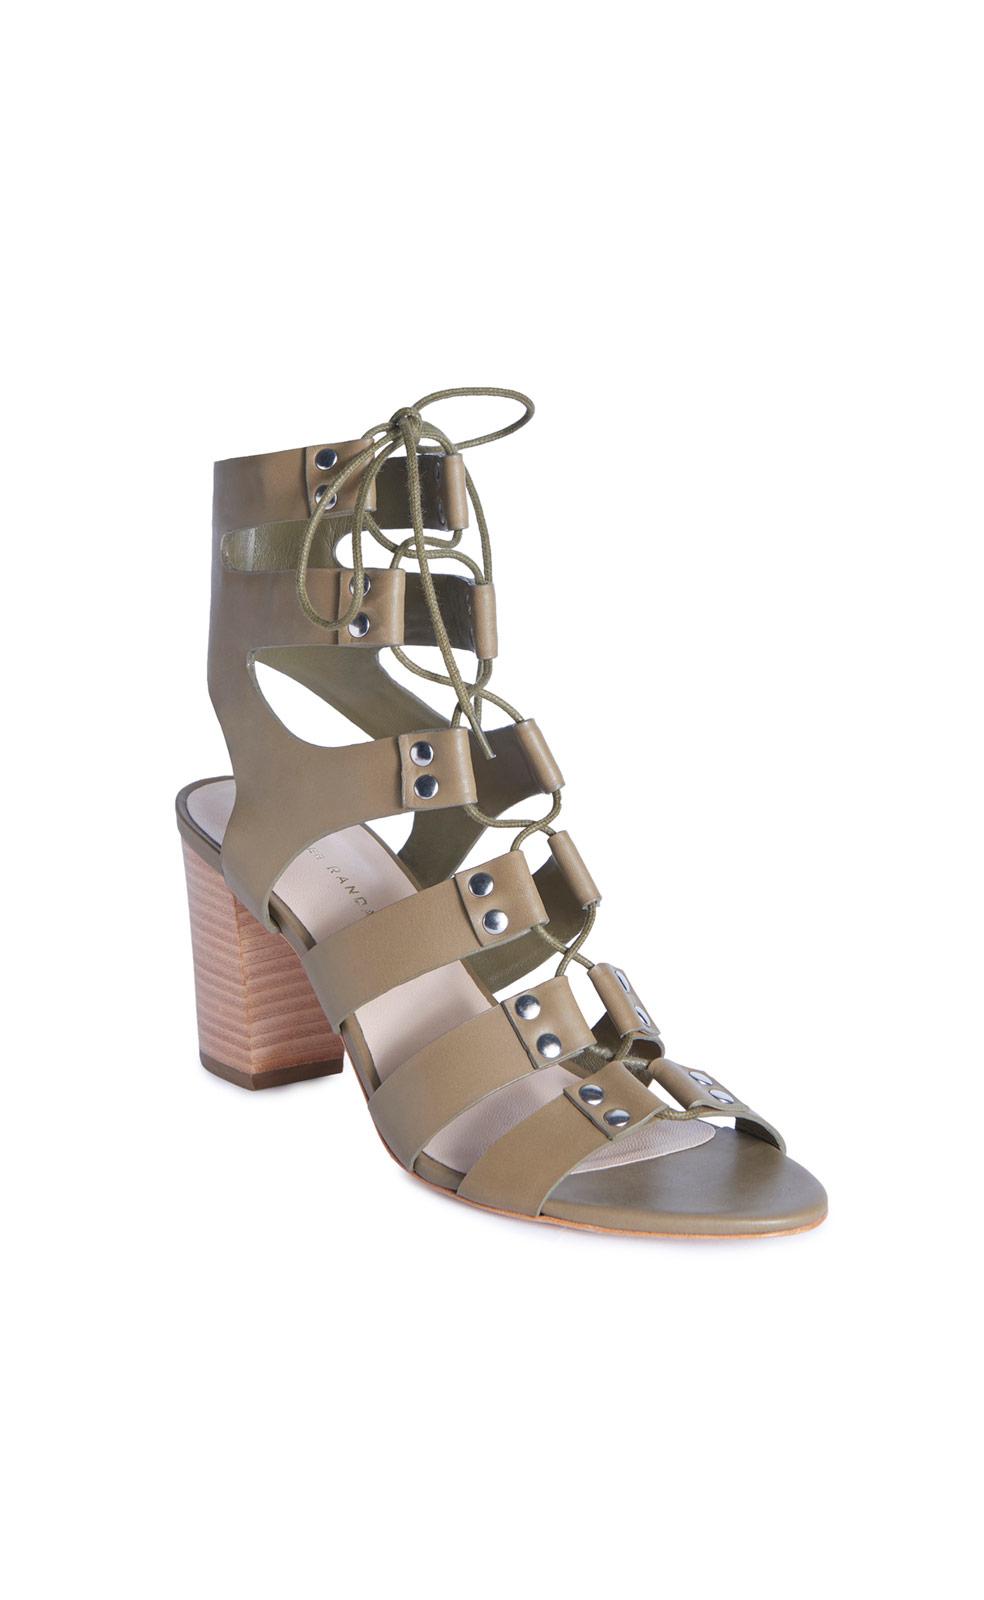 c1cfd5e02a68 Rebecca Taylor Loeffler Randall Hana Gladiator Lace Up Sandal in ...